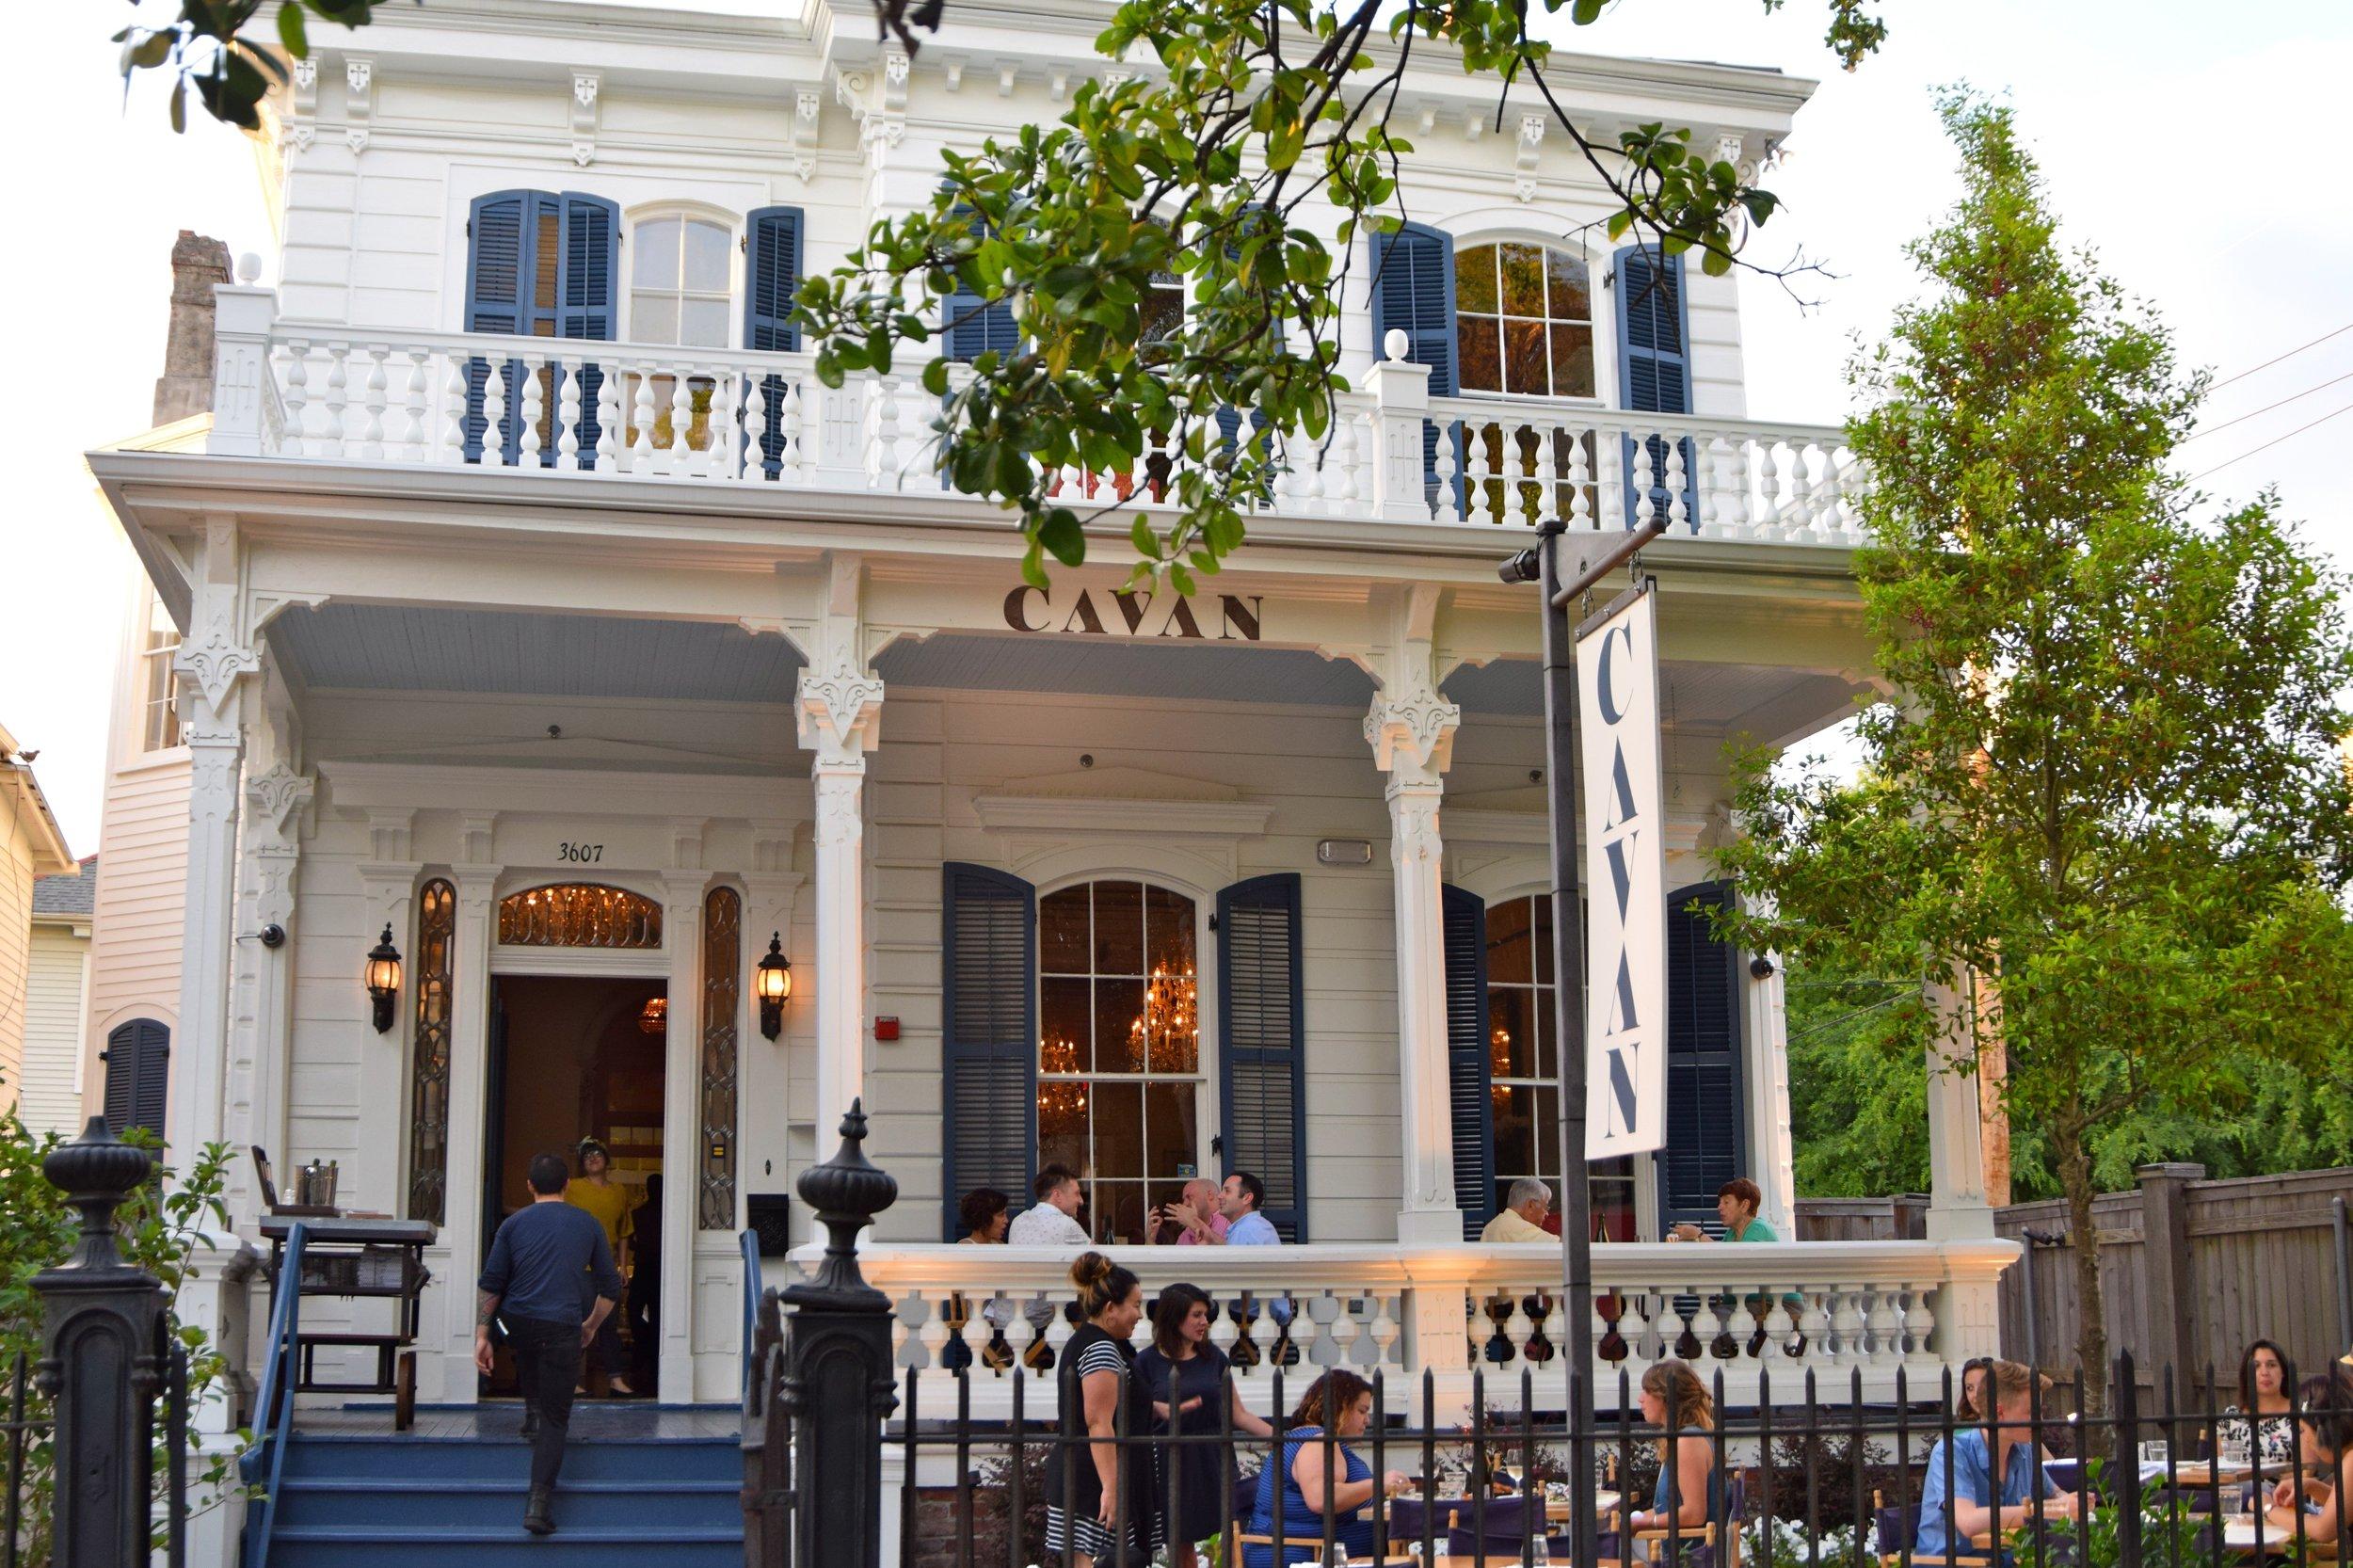 Cavan_restaurant_dog_friendly_guide_to_New_orleans.jpg